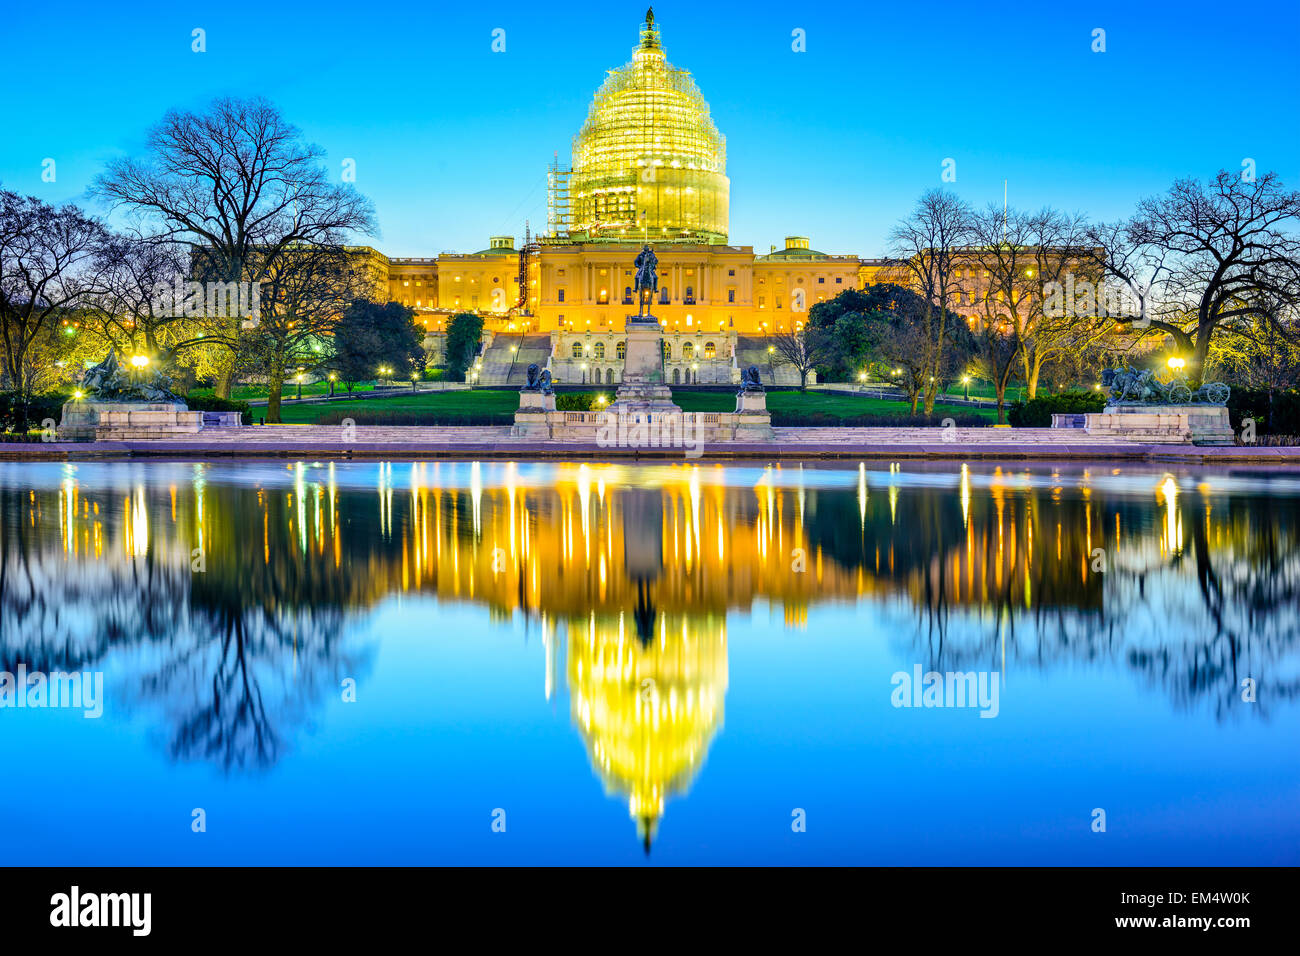 Washington D.C. in Campidoglio. Immagini Stock